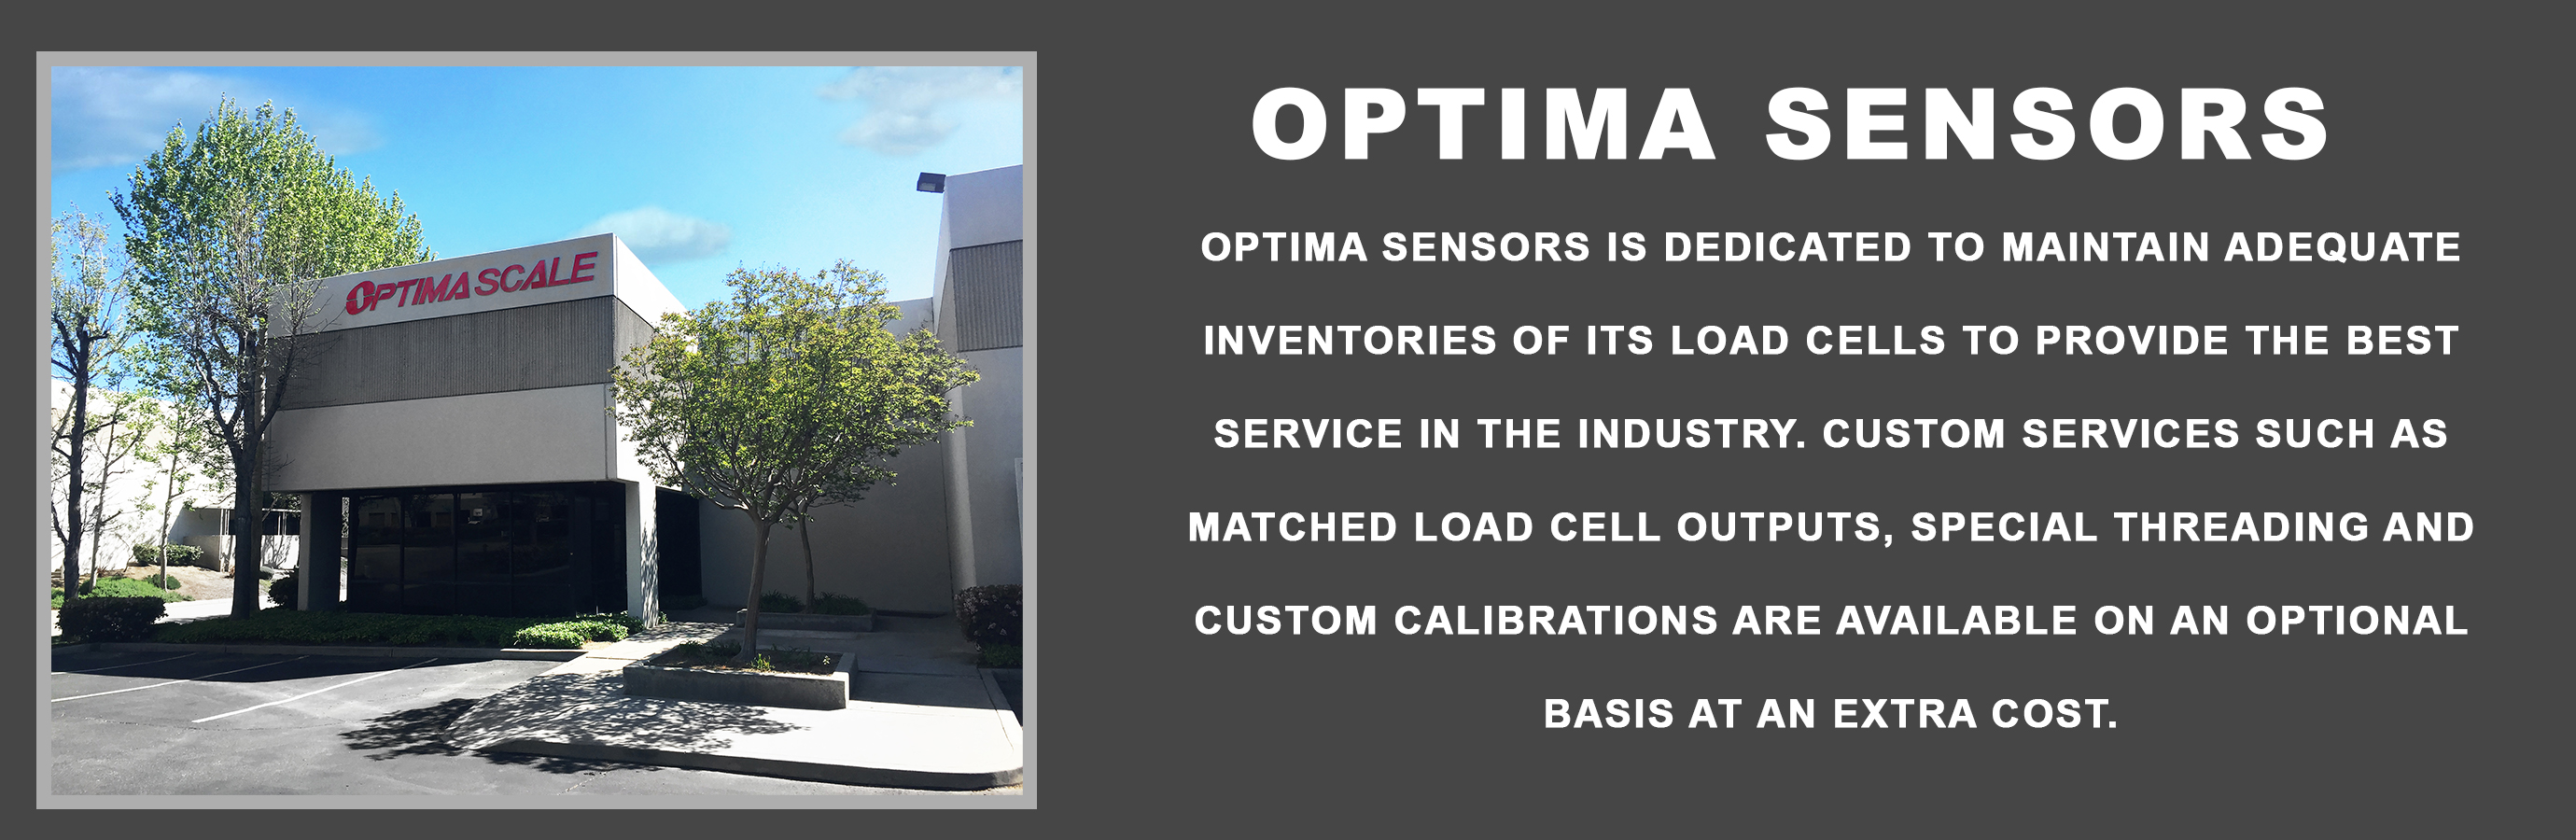 aa-10-optima-sensors.jpg